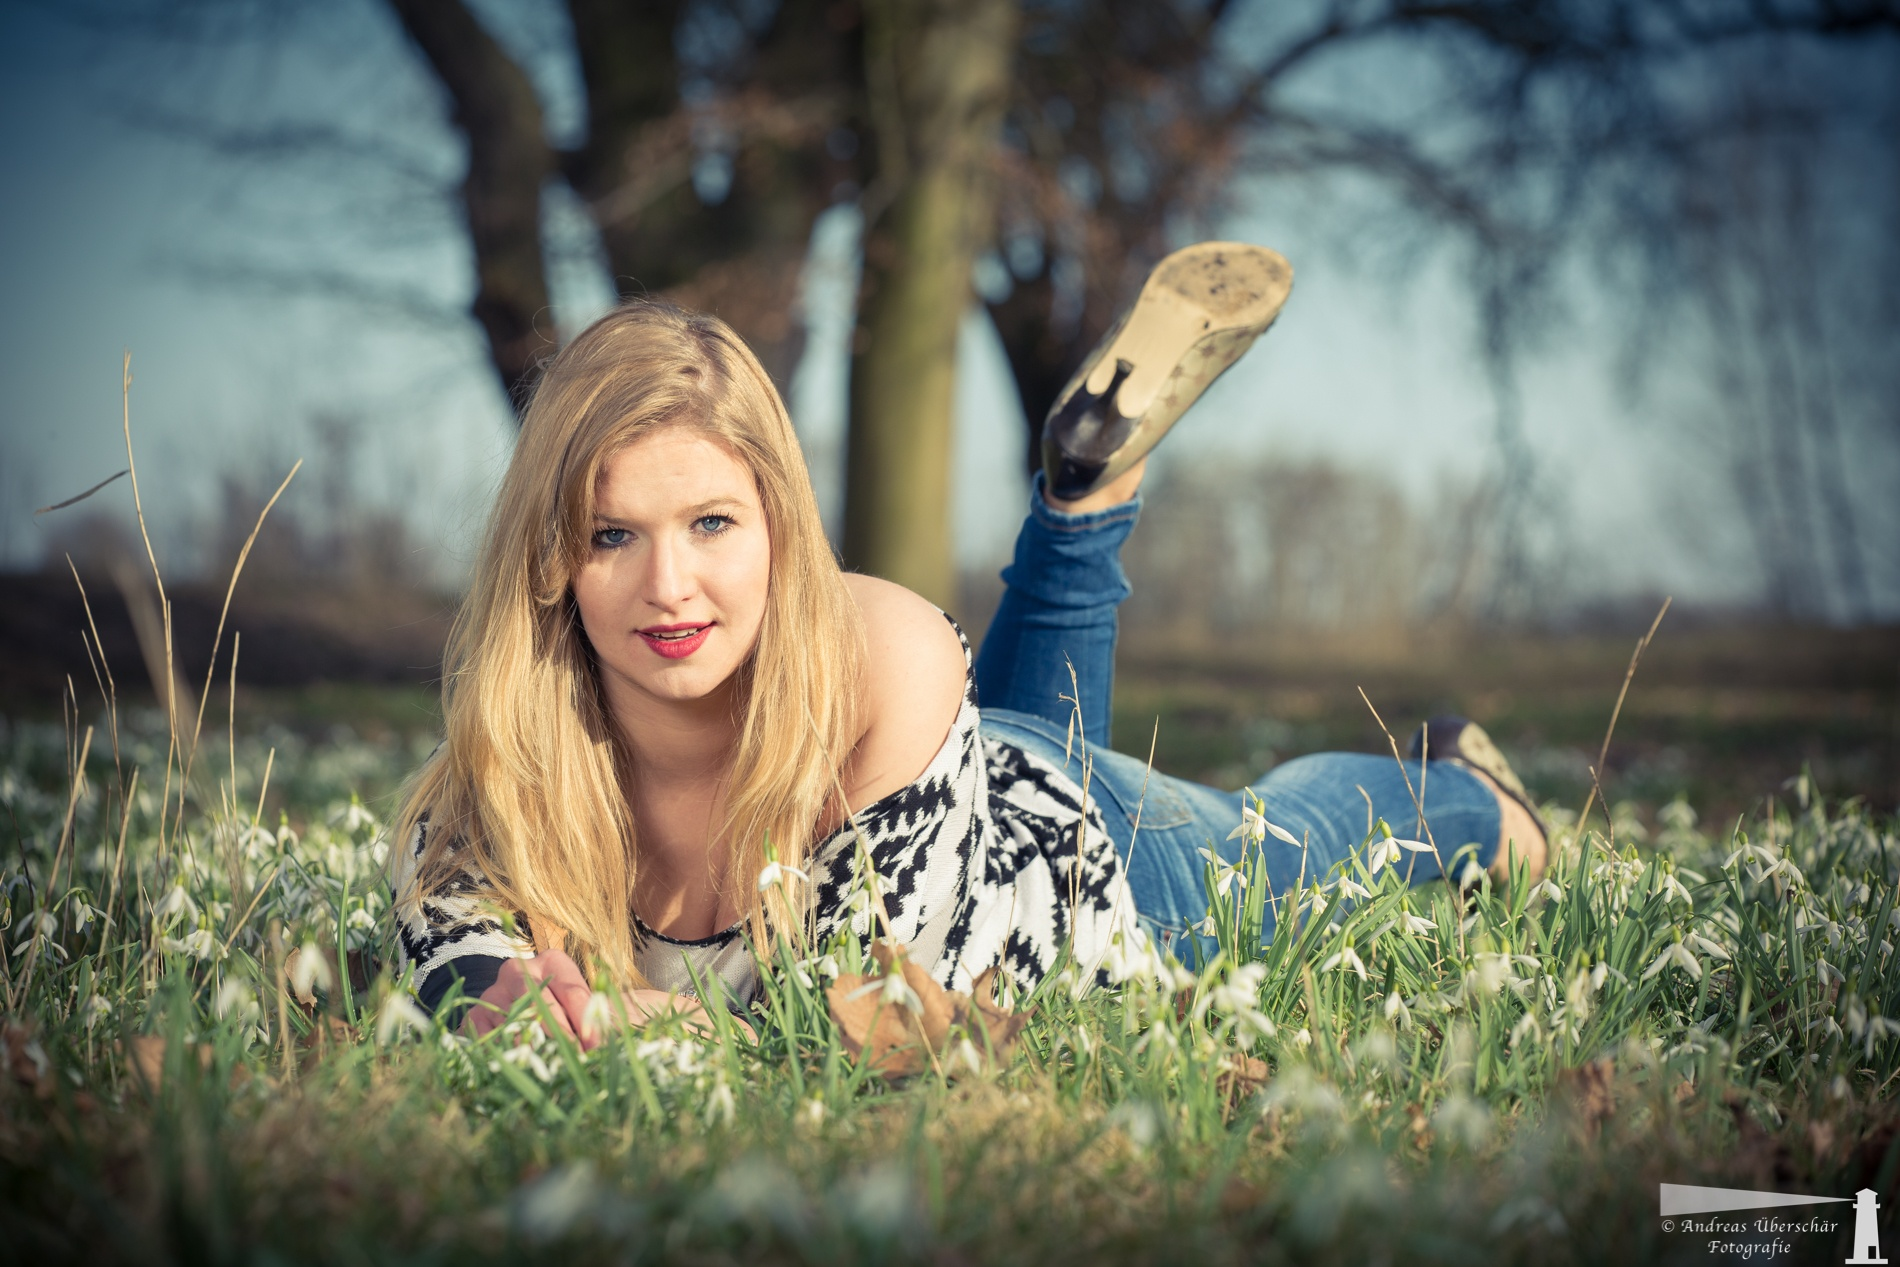 der Frühling ist nah - spring is coming by Andreas Überschär Fotografie